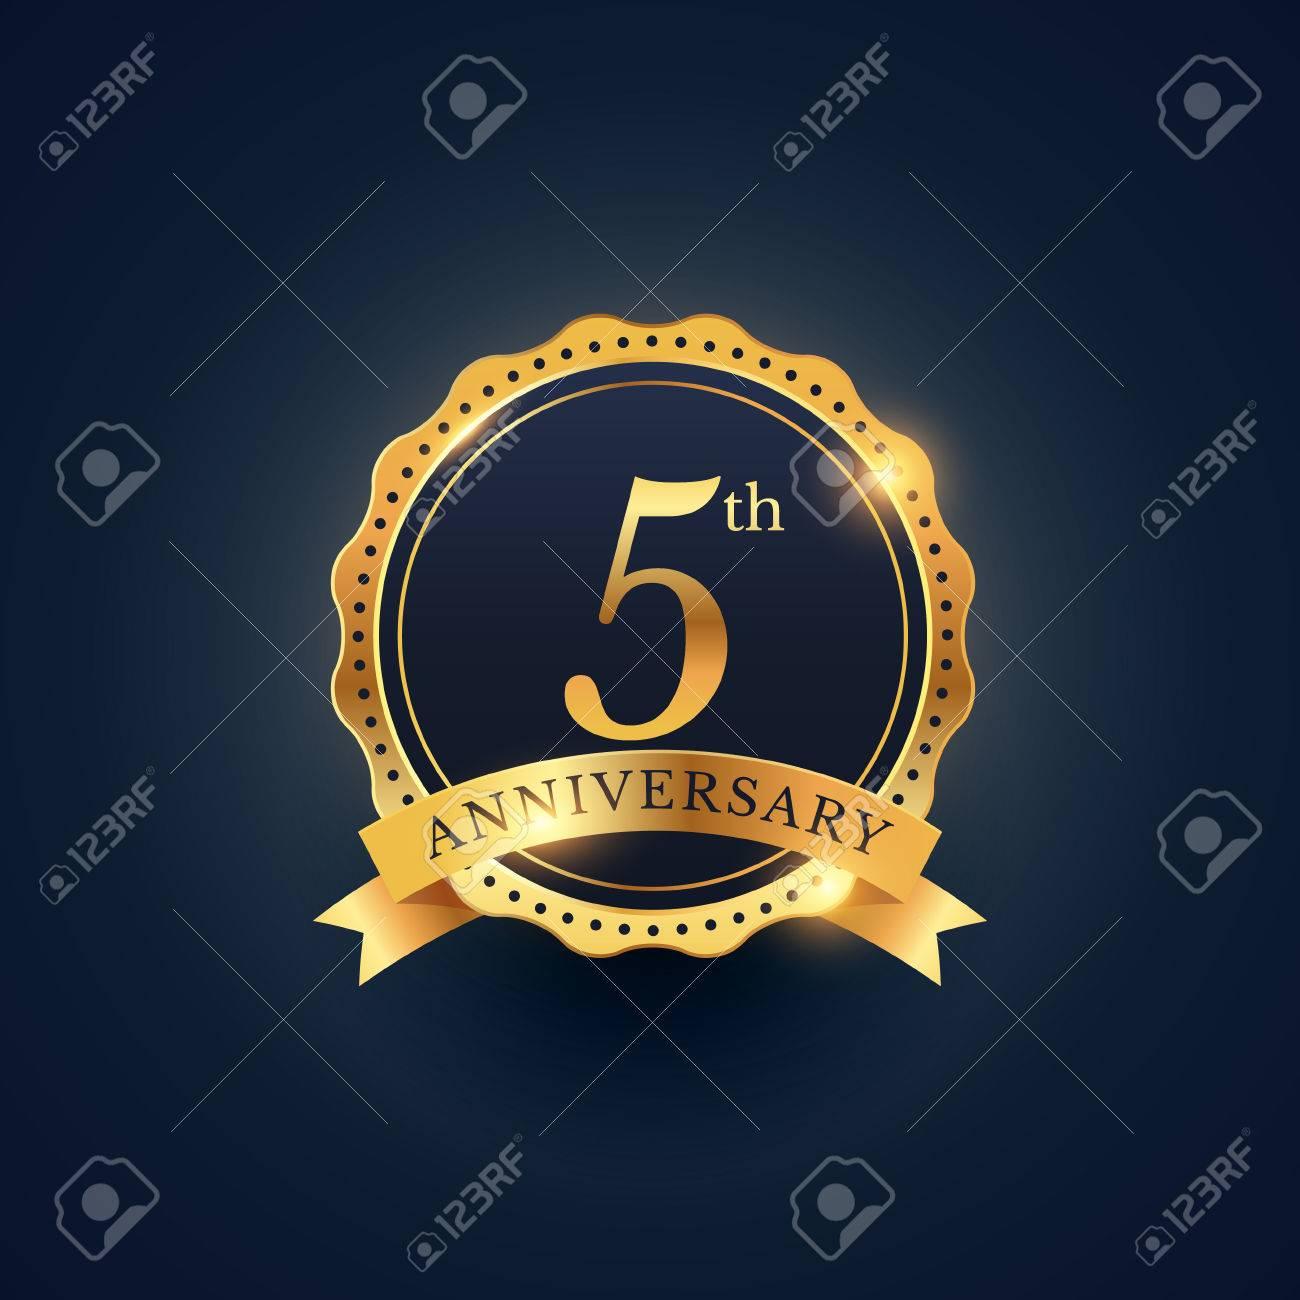 5th anniversary celebration badge label in golden color - 61039981